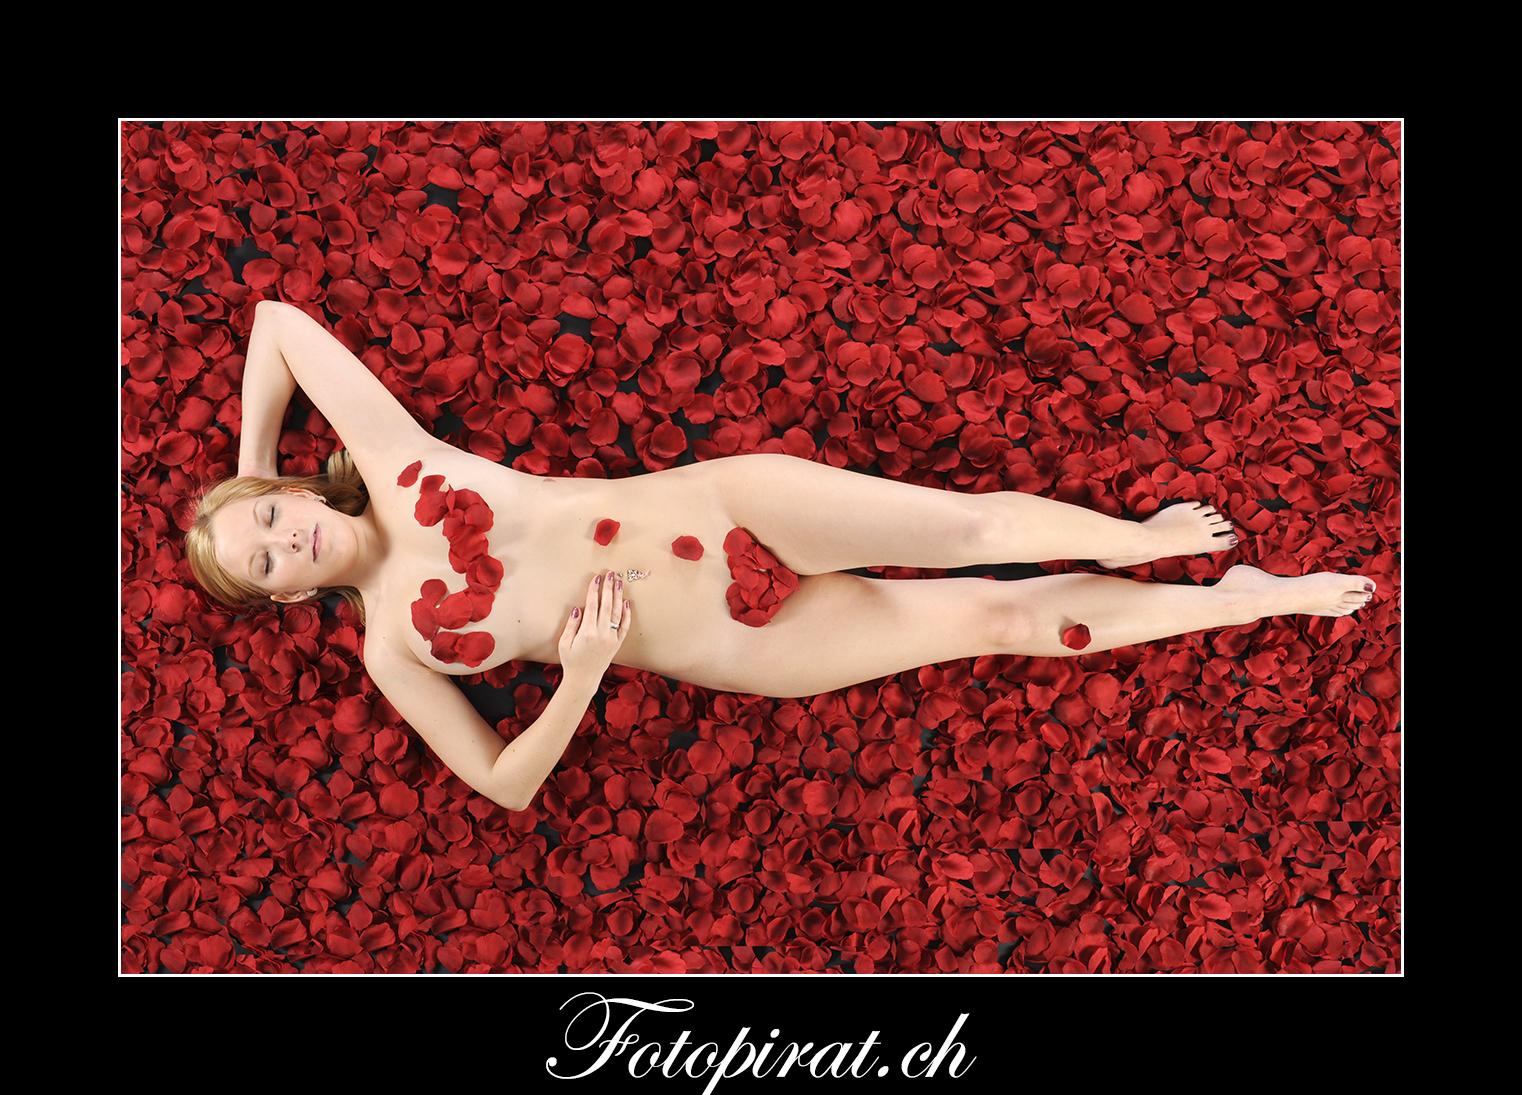 Fotoshooting, Fotostudio, Akt, Nackt, Nudeart, Nude, Modelagentur, Fotomodel, Rosenblätter, American Beauty, eyecatcher, Dessous